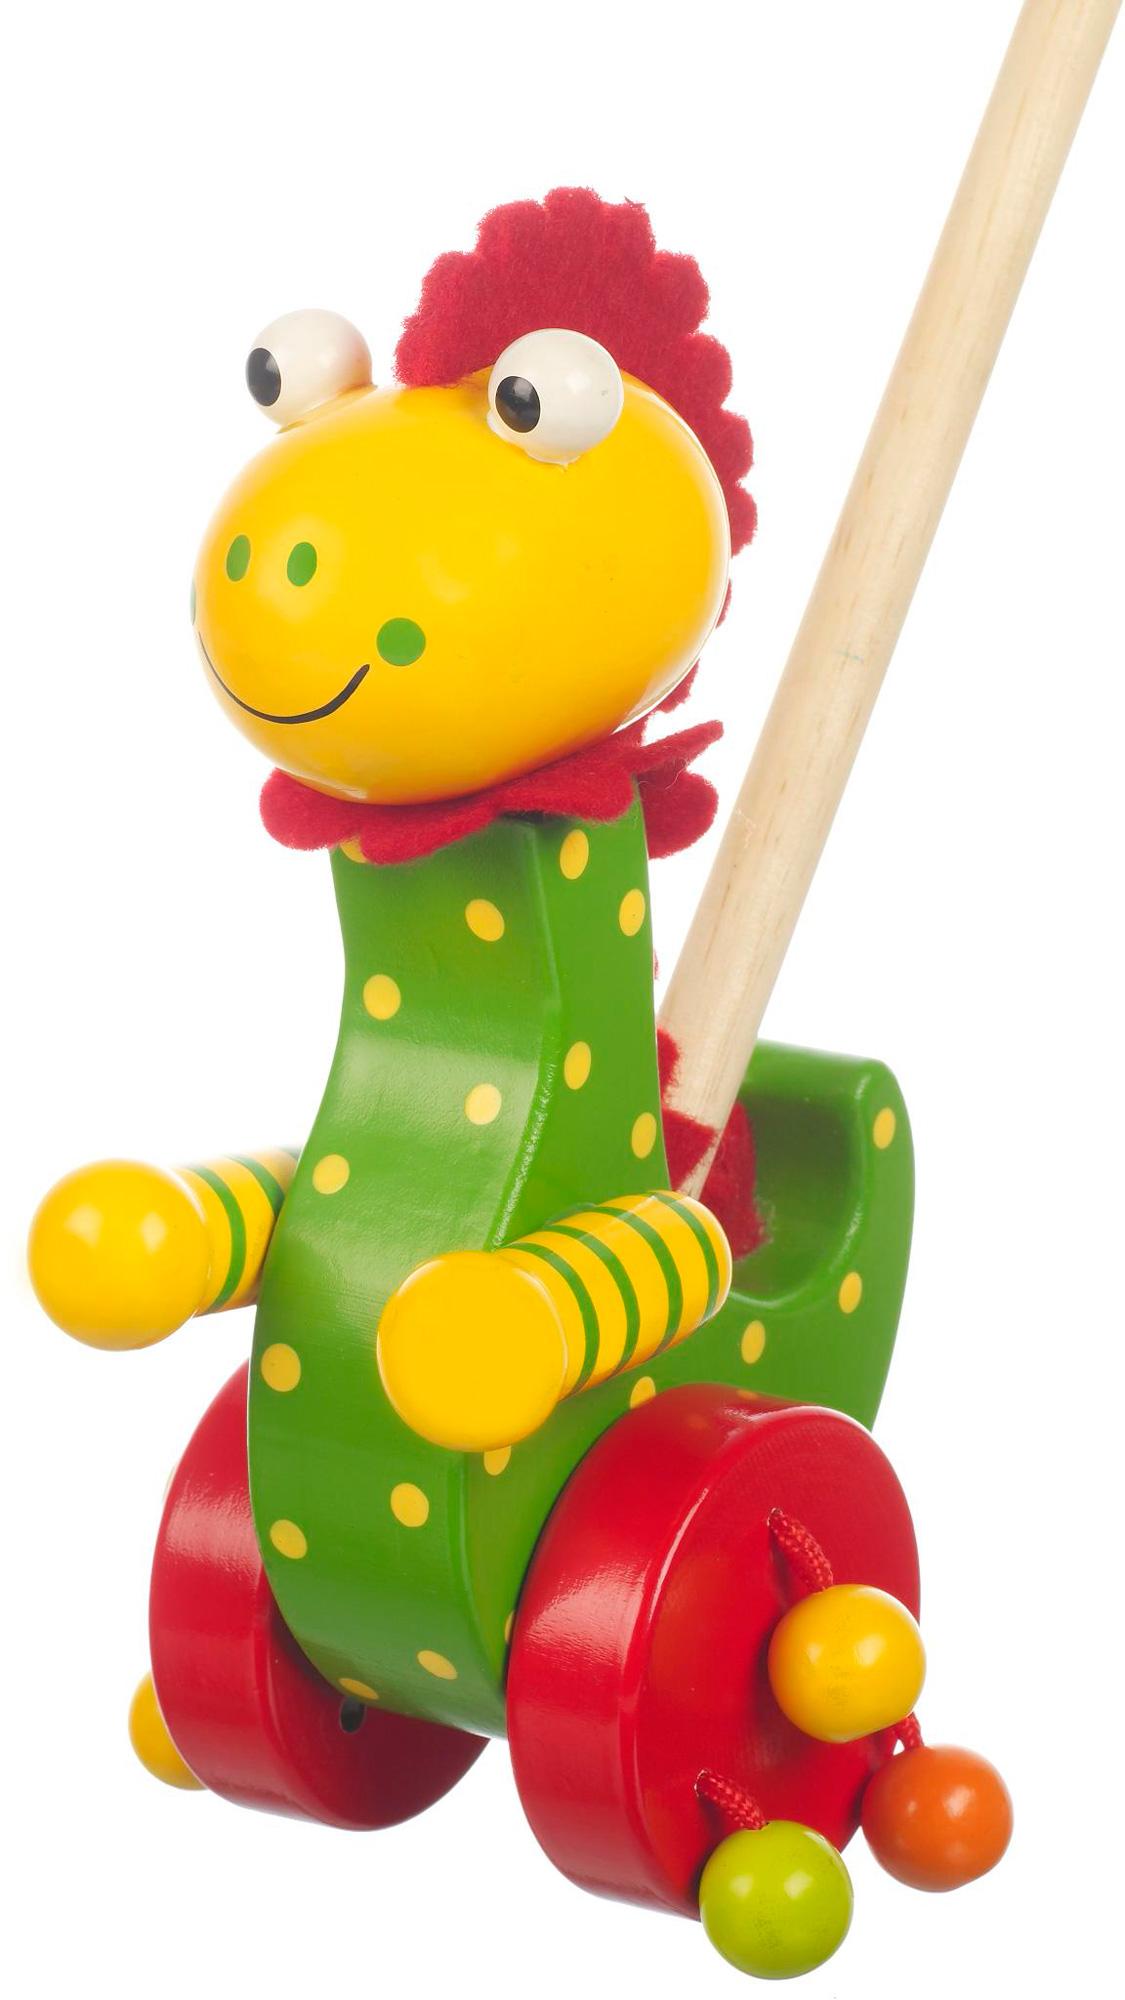 orange tree toys push along wooden toy baby toddler child walking new ebay. Black Bedroom Furniture Sets. Home Design Ideas